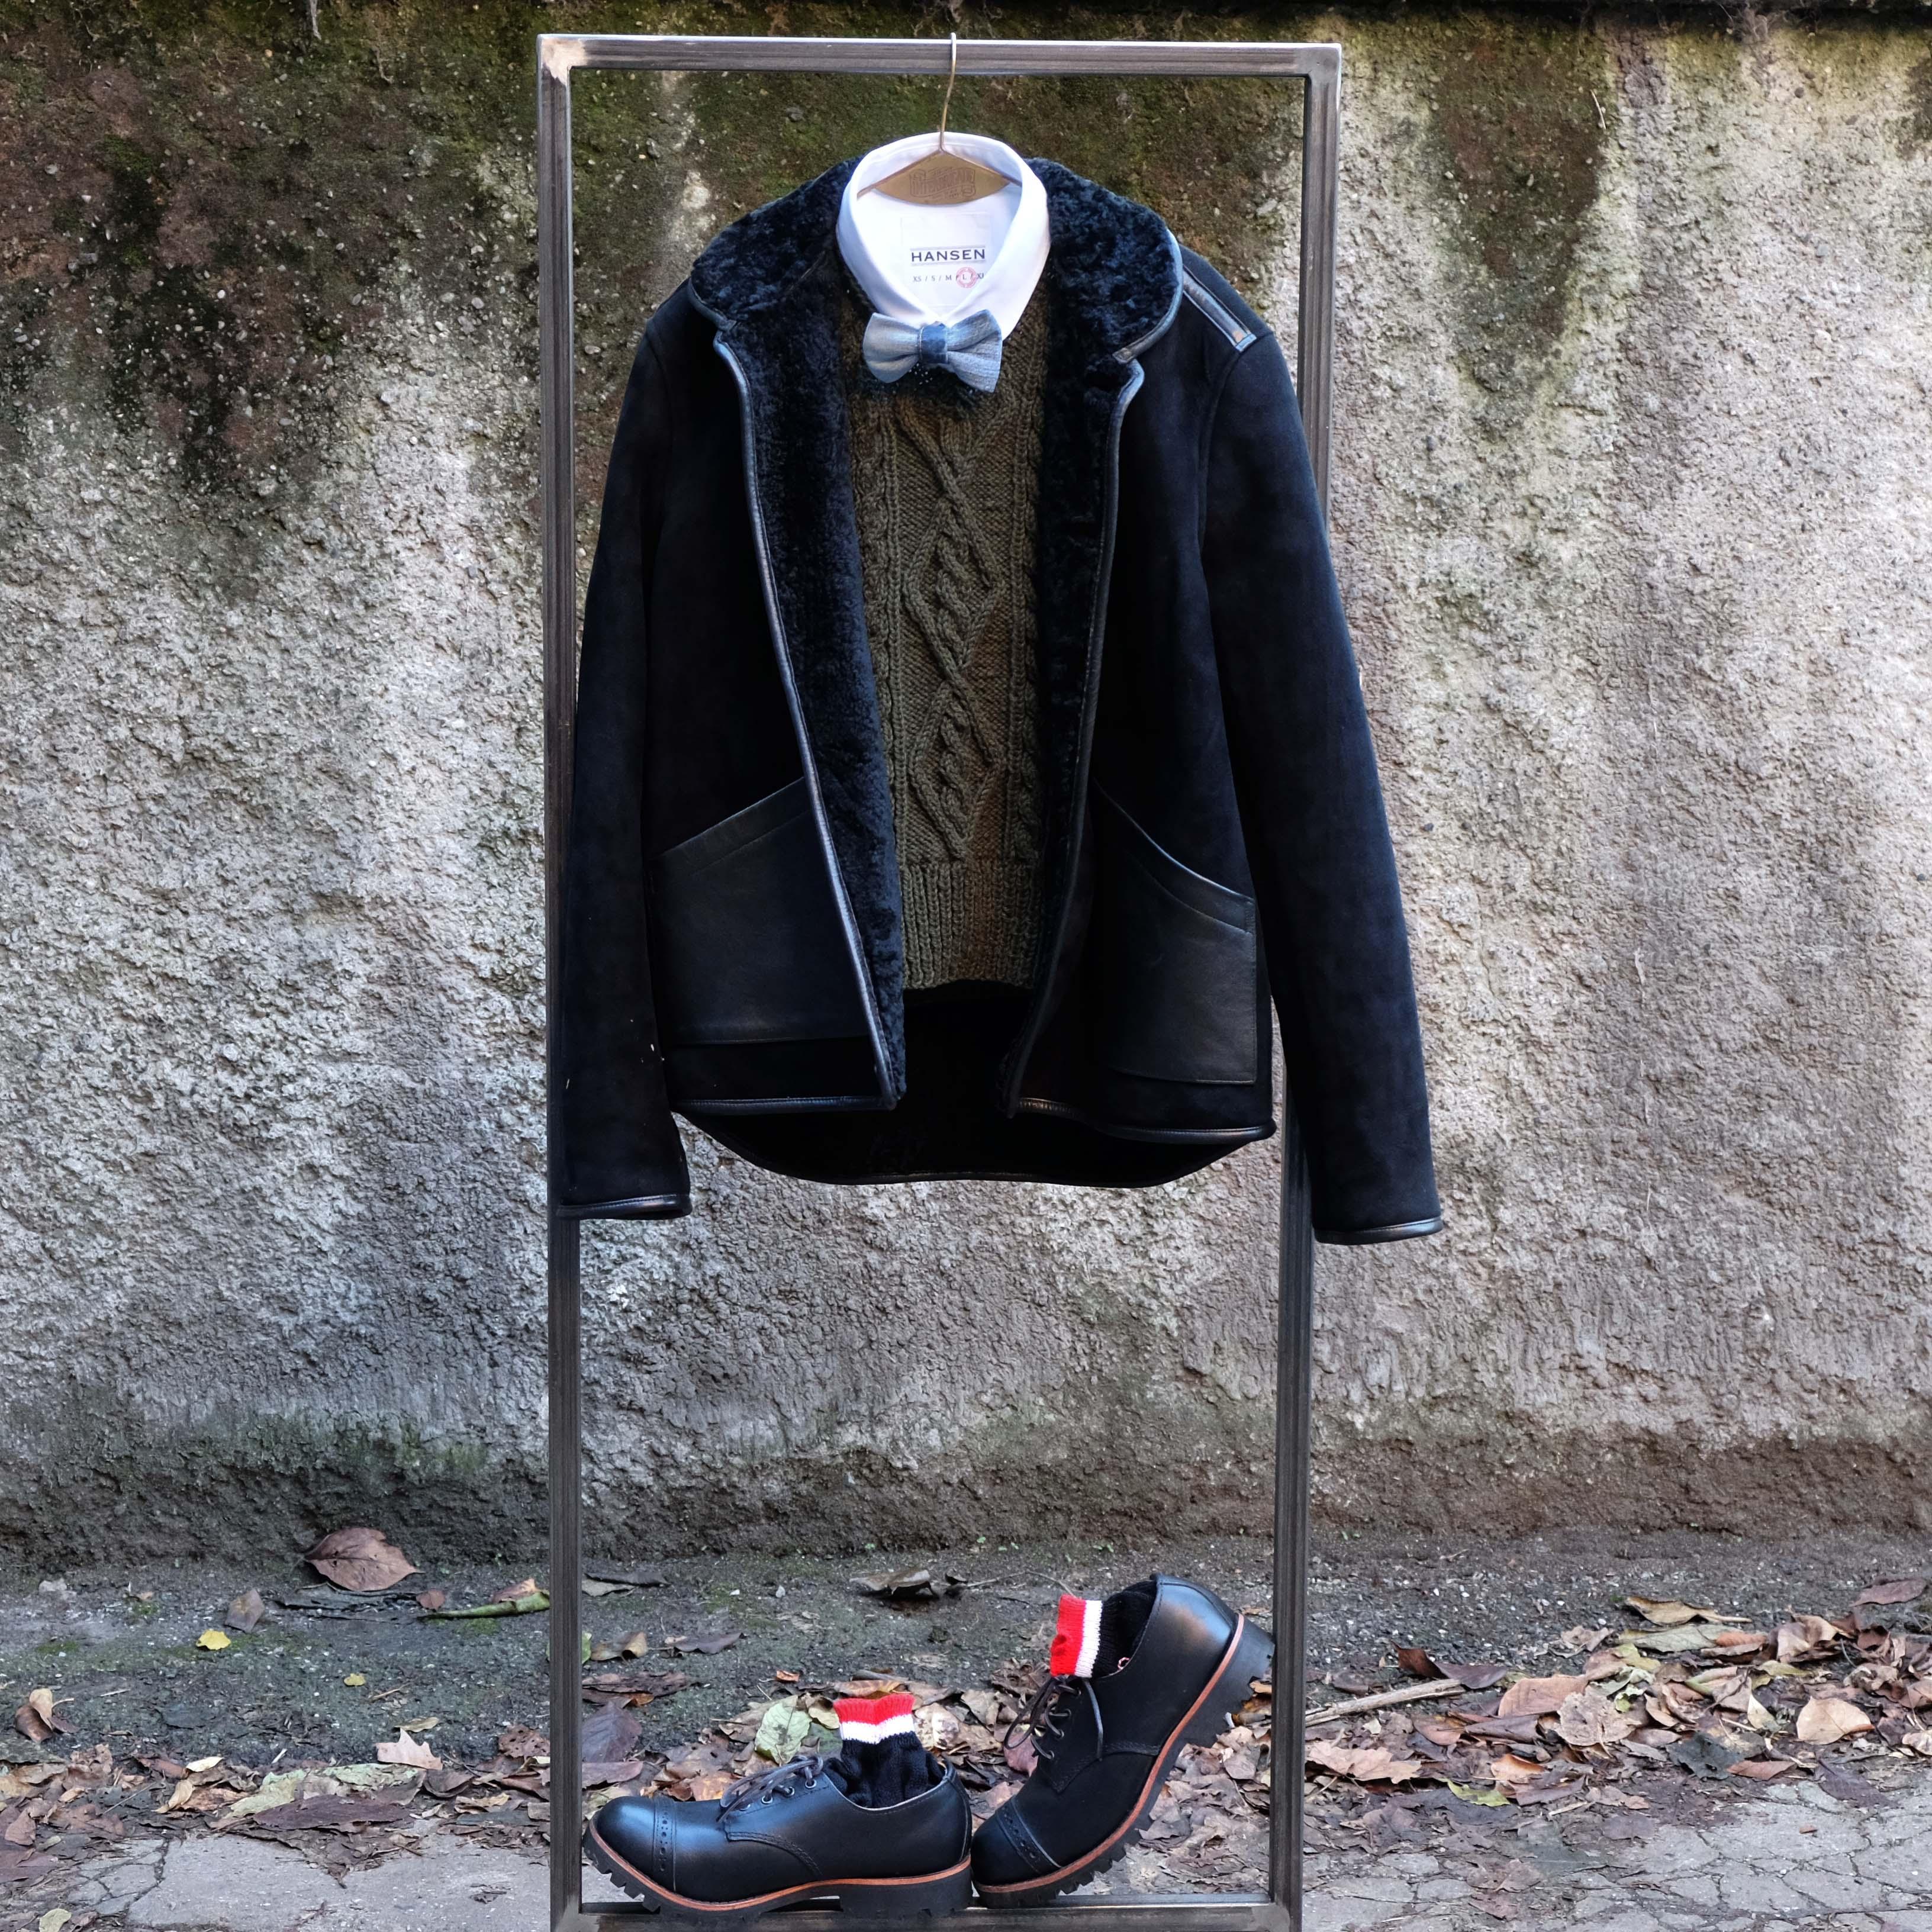 hansen-hemd-interbrigade-pollunder-youmustcreate-jacke-vintagehose-02